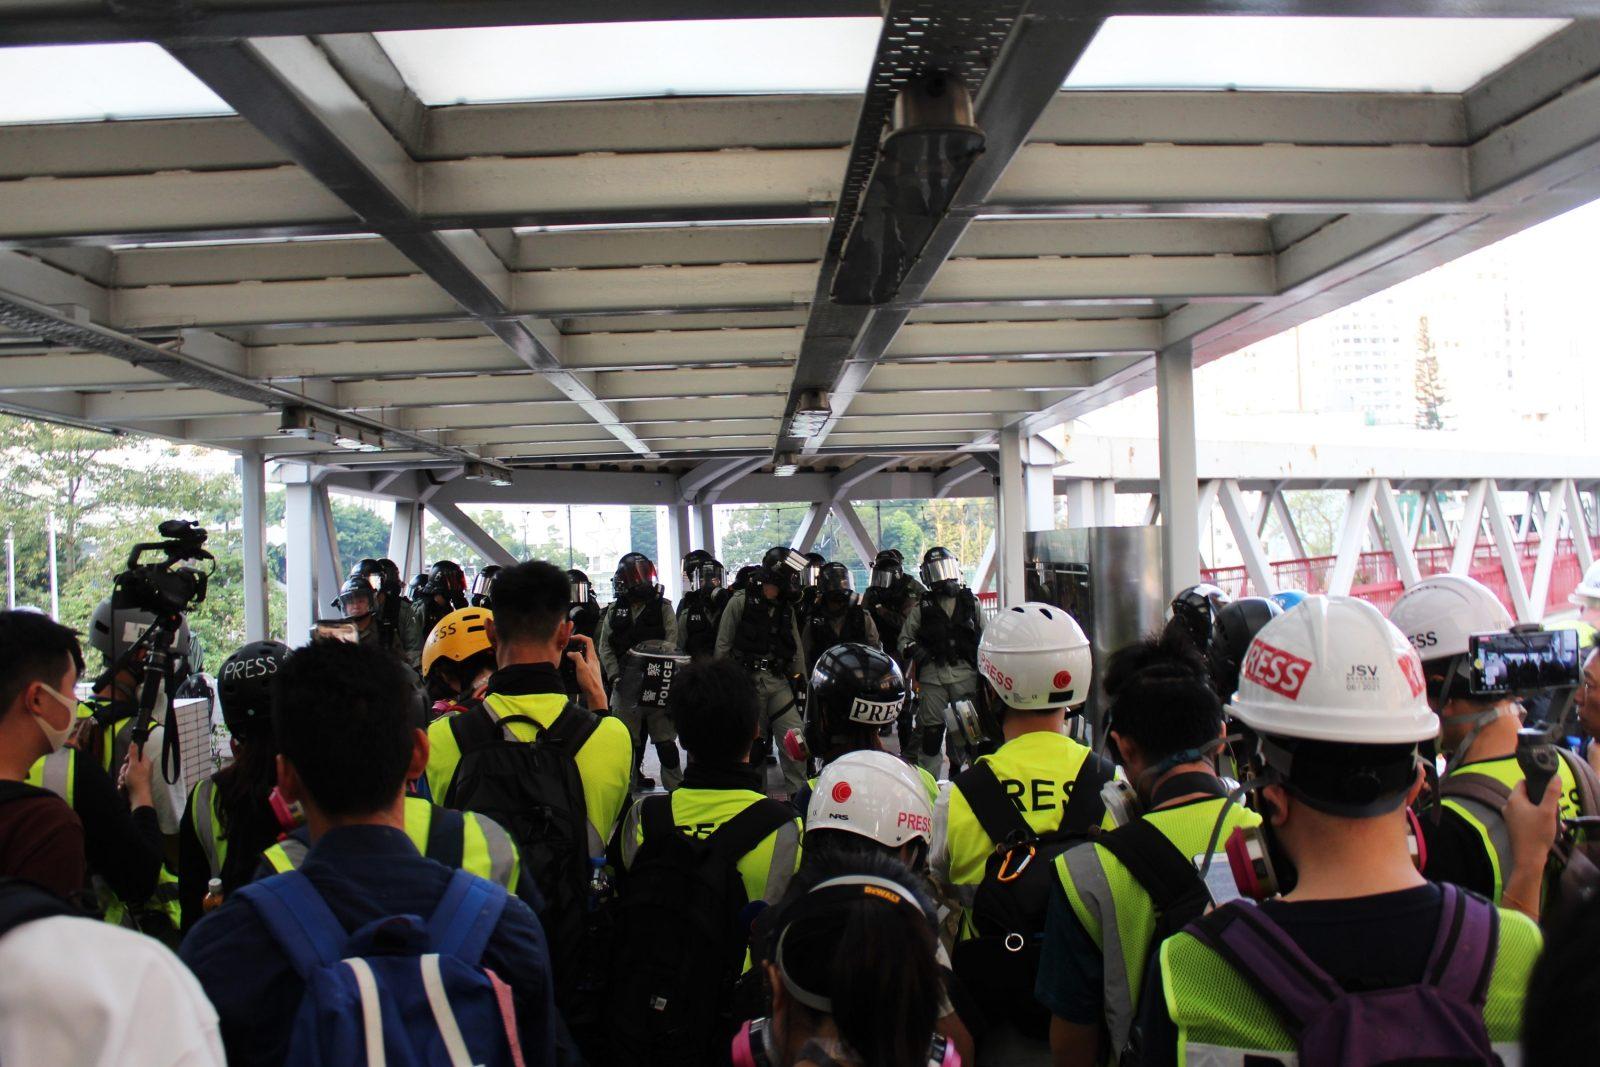 Pers bij protest in Hongkongse wijk Tsuen Wan – RvdK